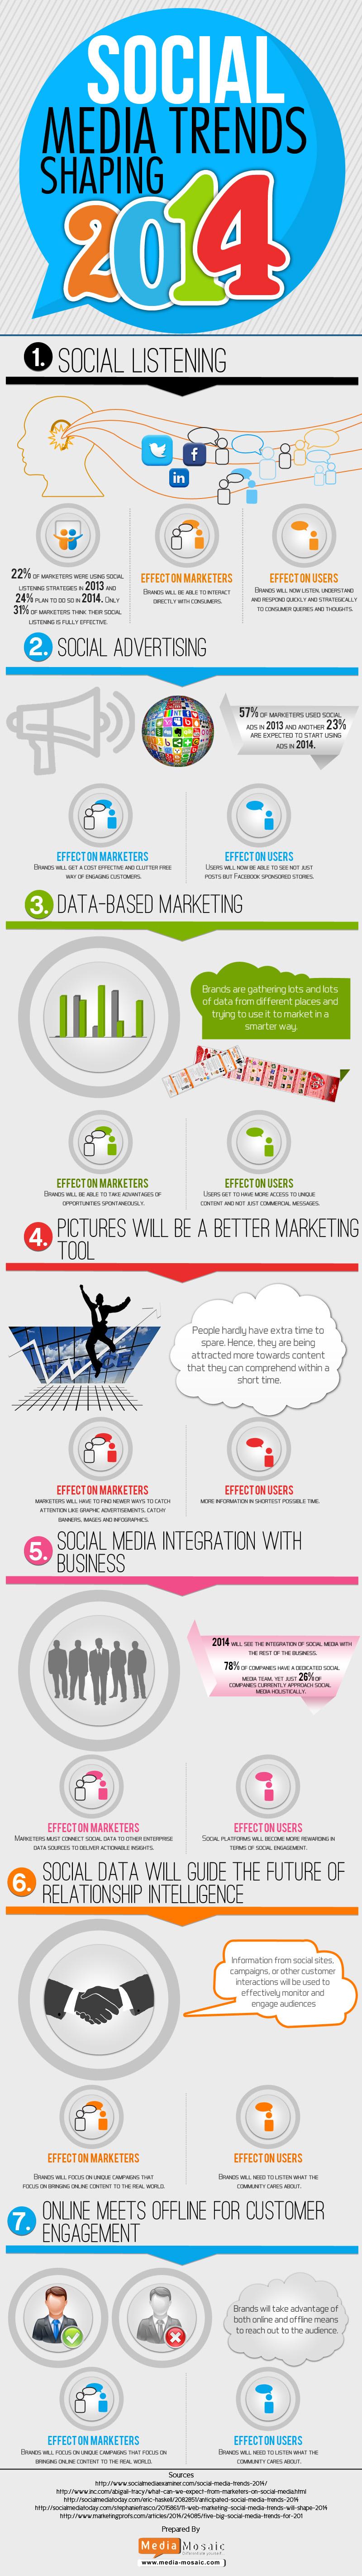 Social-Media-listening-Trends-2014-infographic